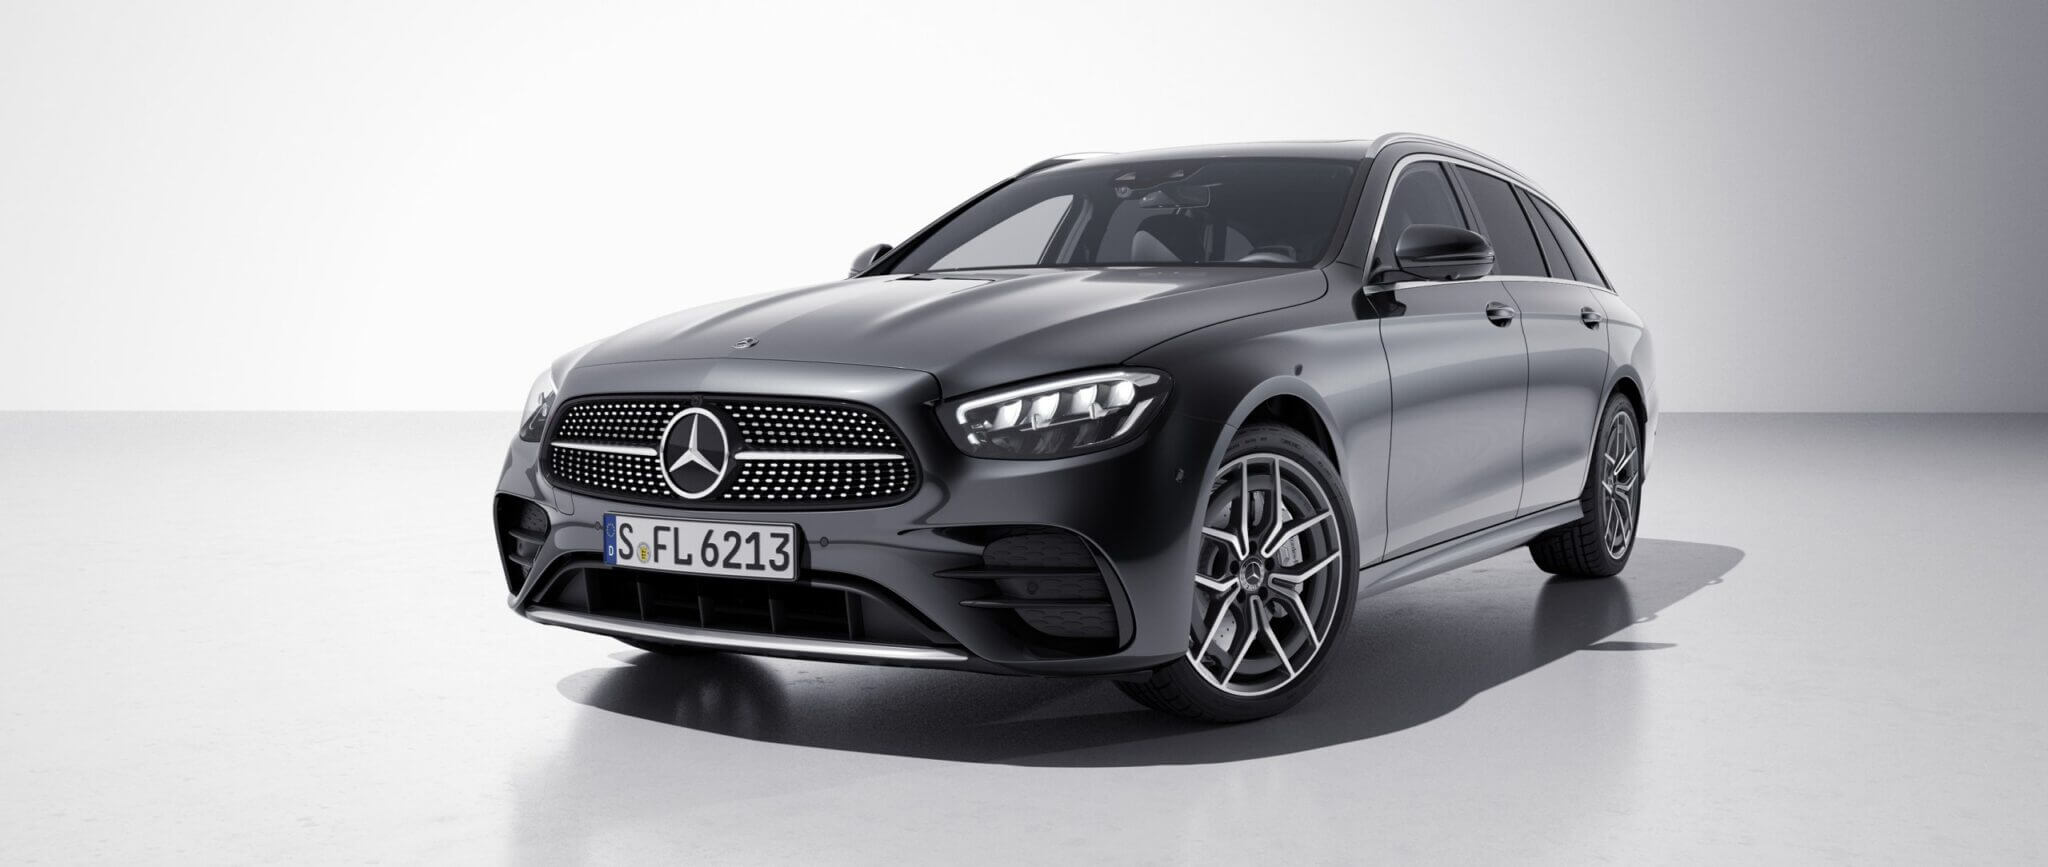 New 2021 Mercedes E-class official info and photos